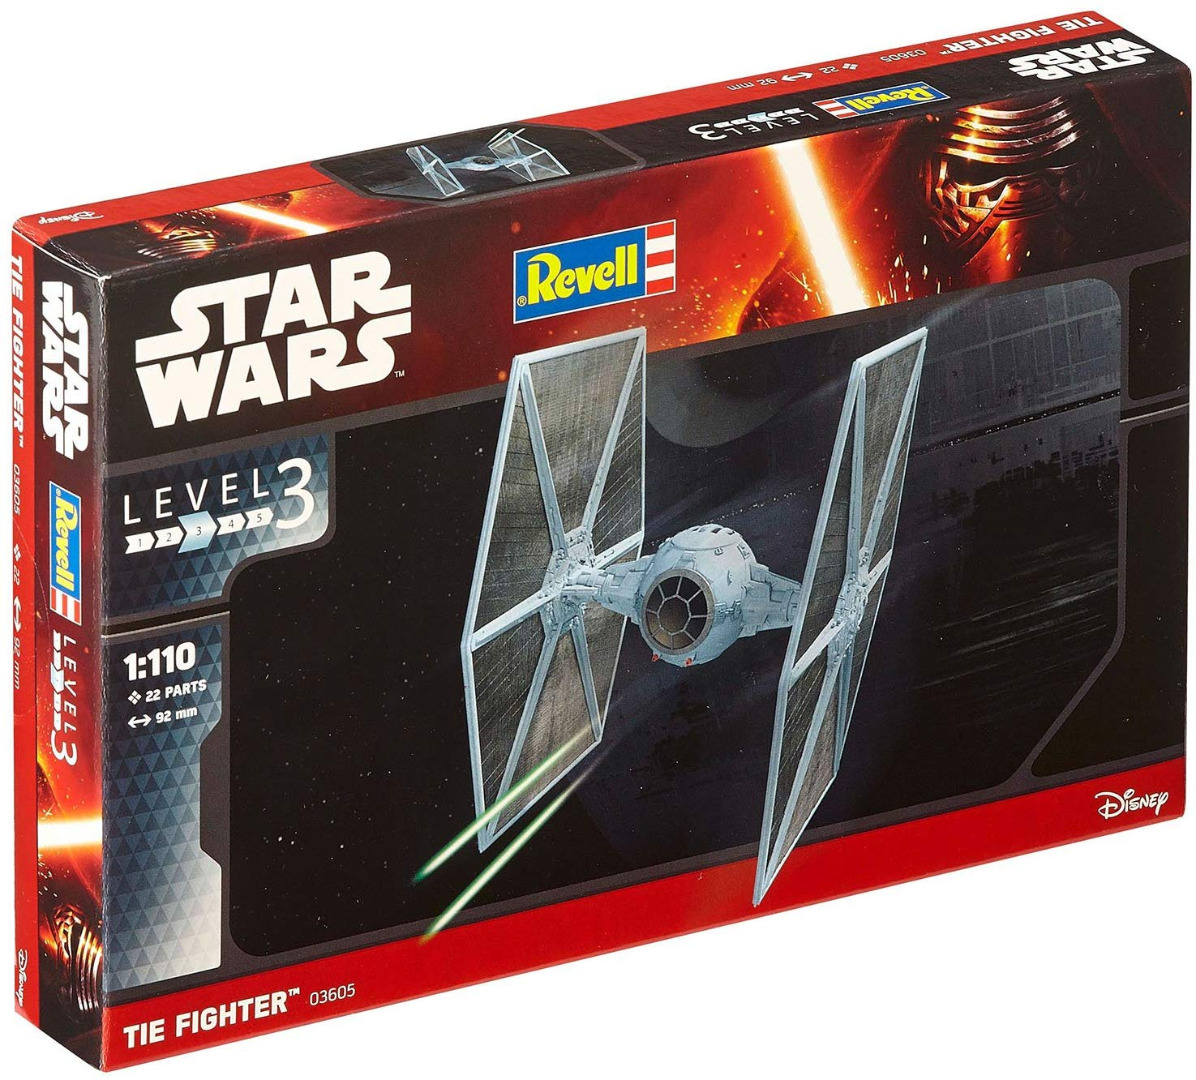 Revell Model Kit Star Wars Tie Fighter Scale 1:110